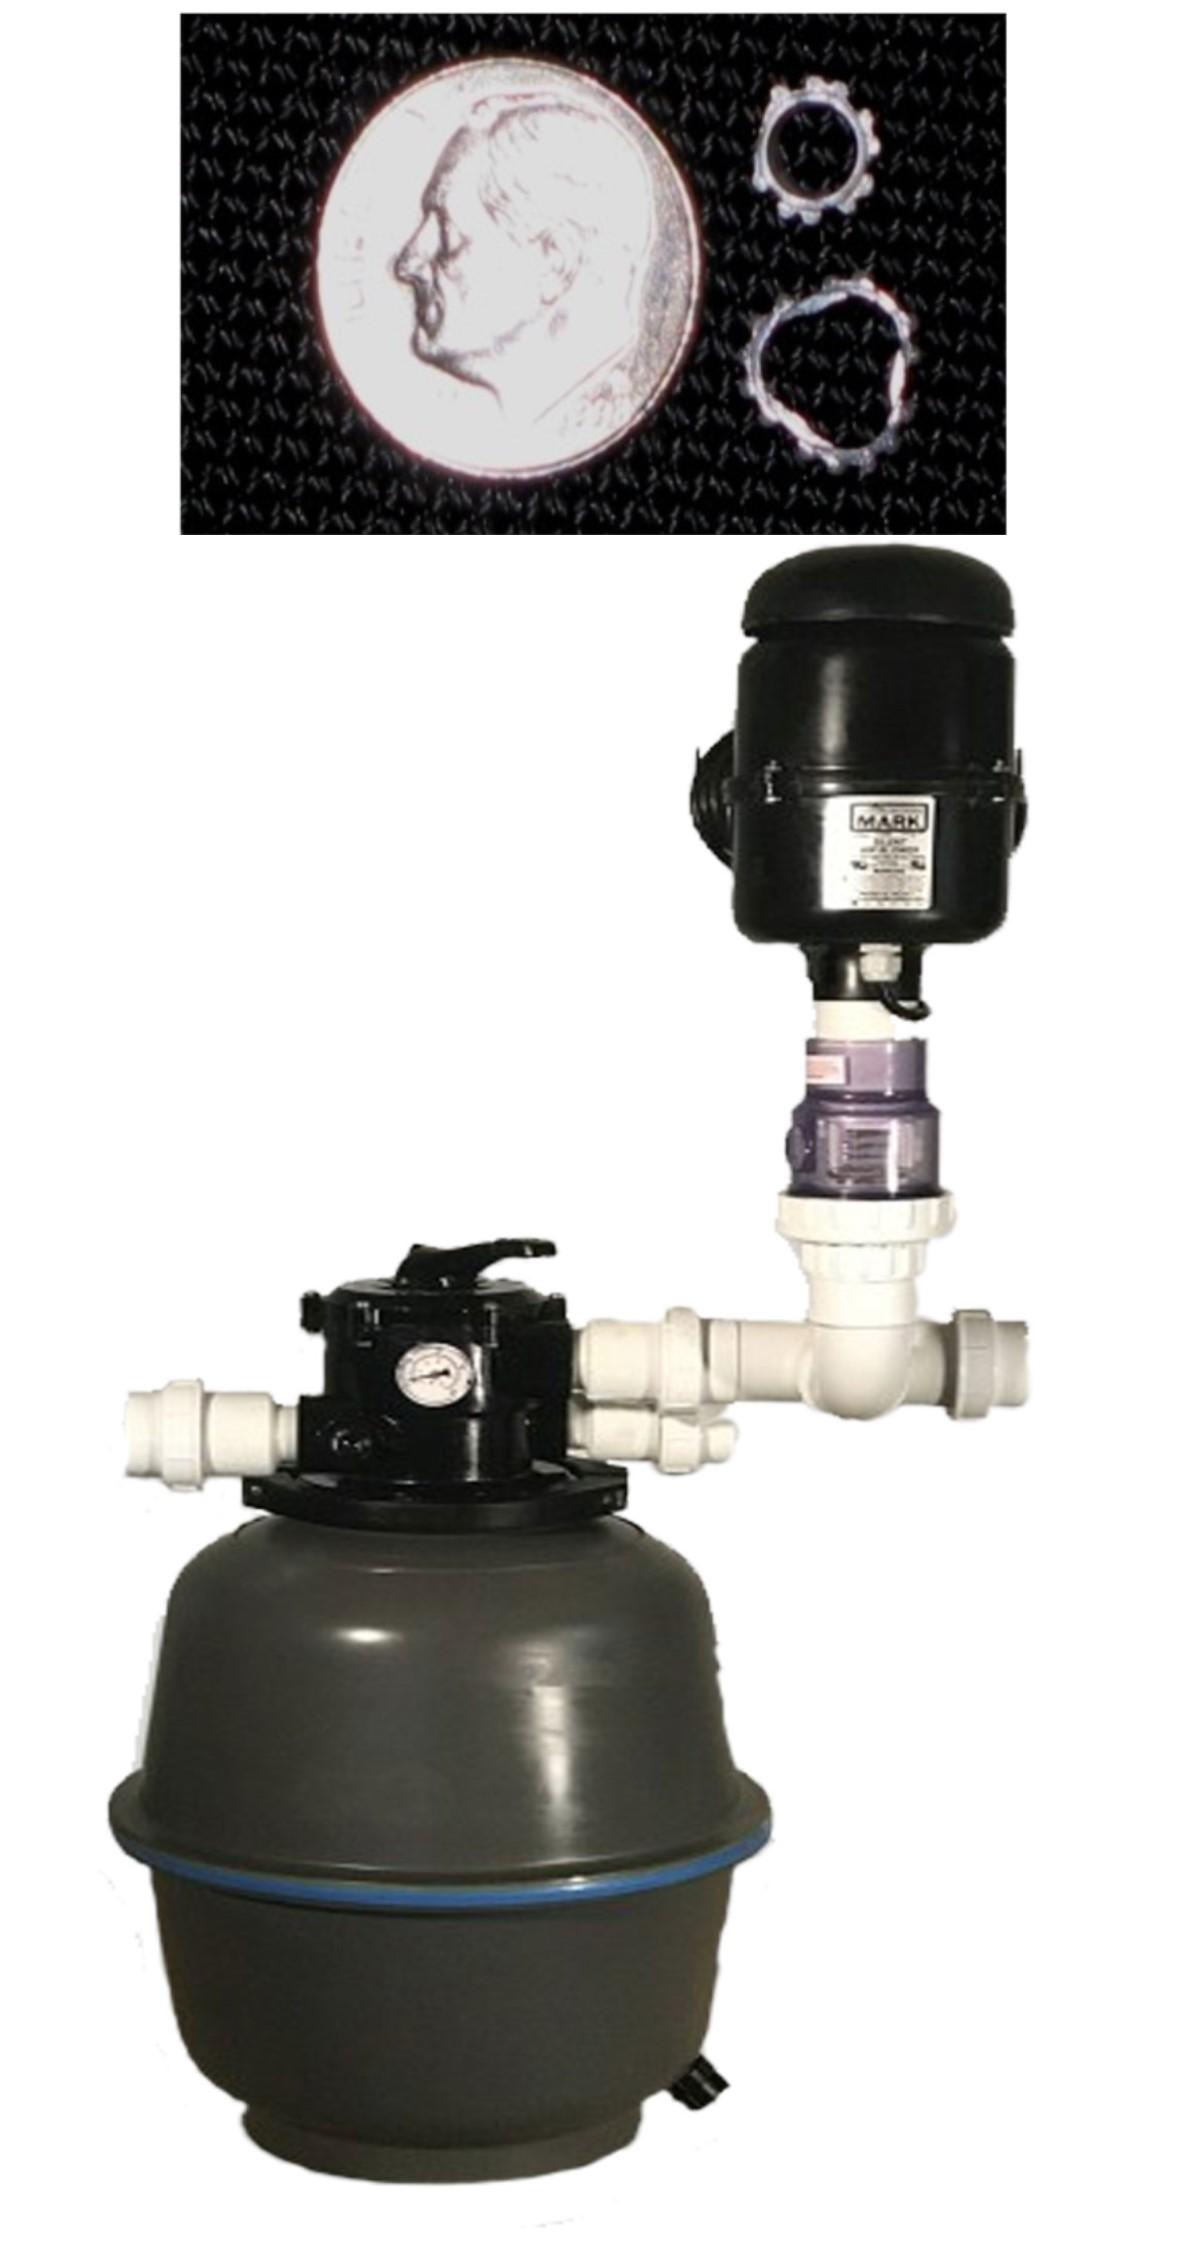 GCTek PondKeeper 2.5 Pond Filter